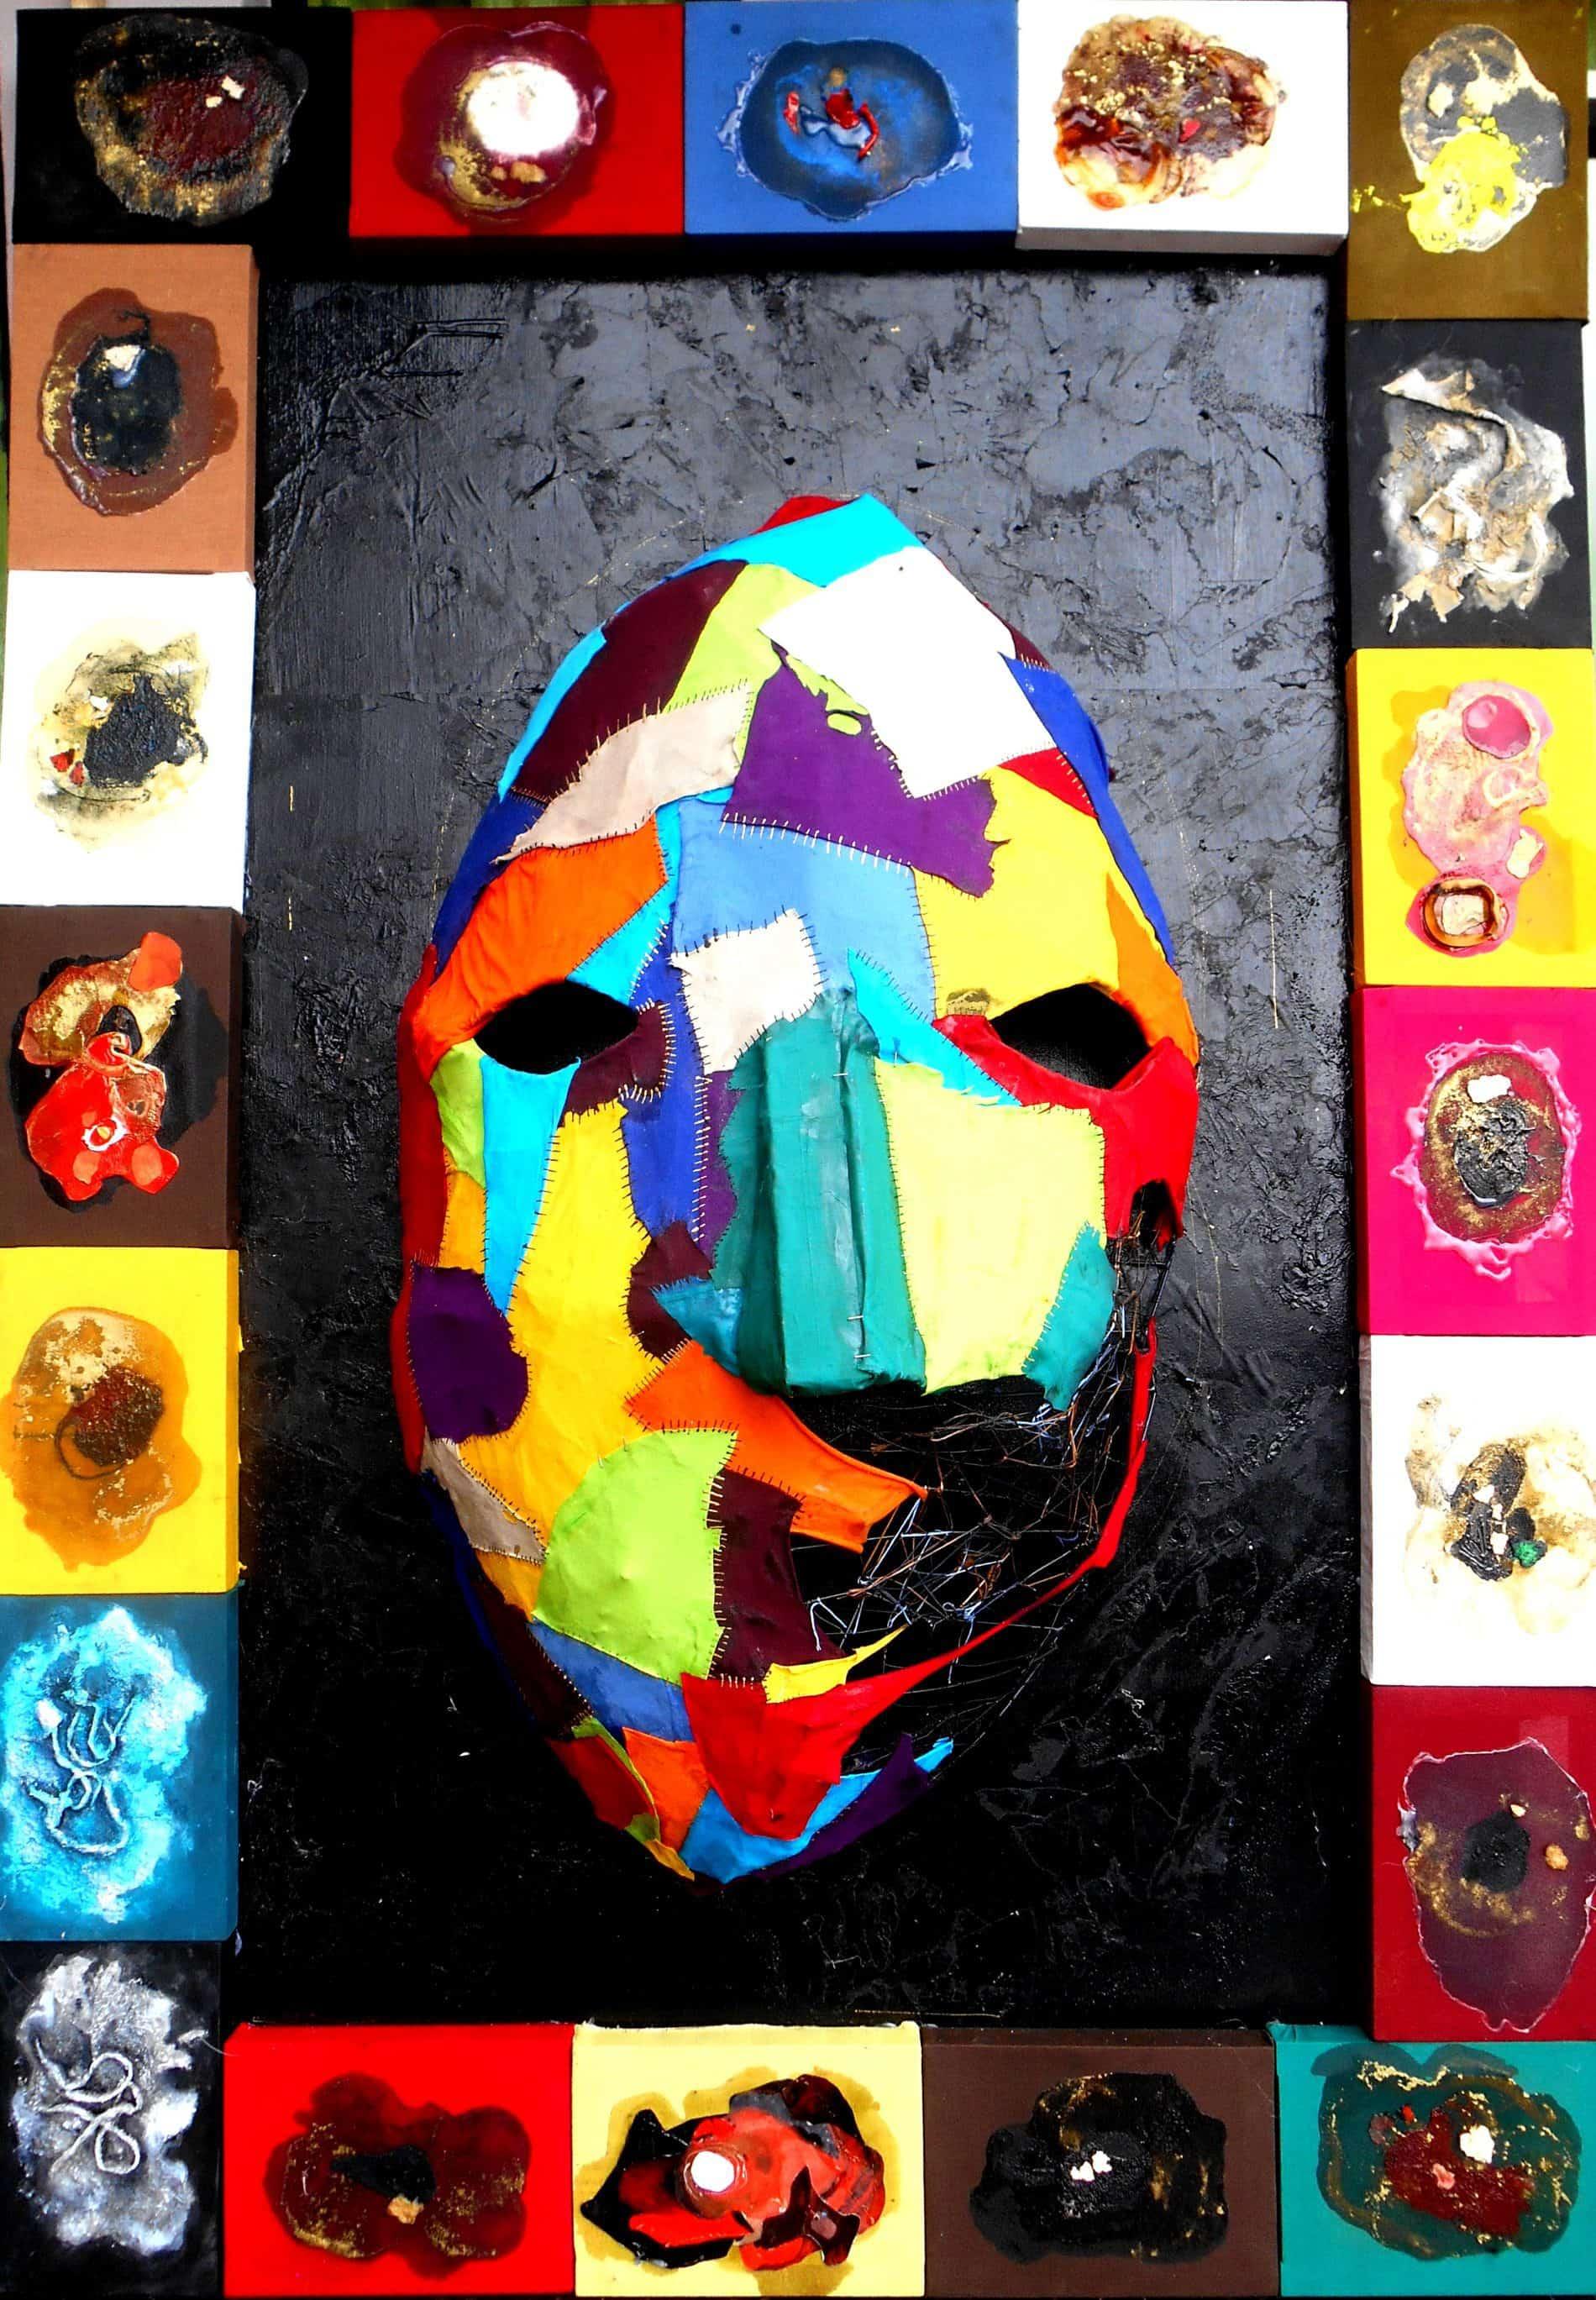 Mauritius Arts & Artists - mauritius-arts-sandeep-keenoo-intergration